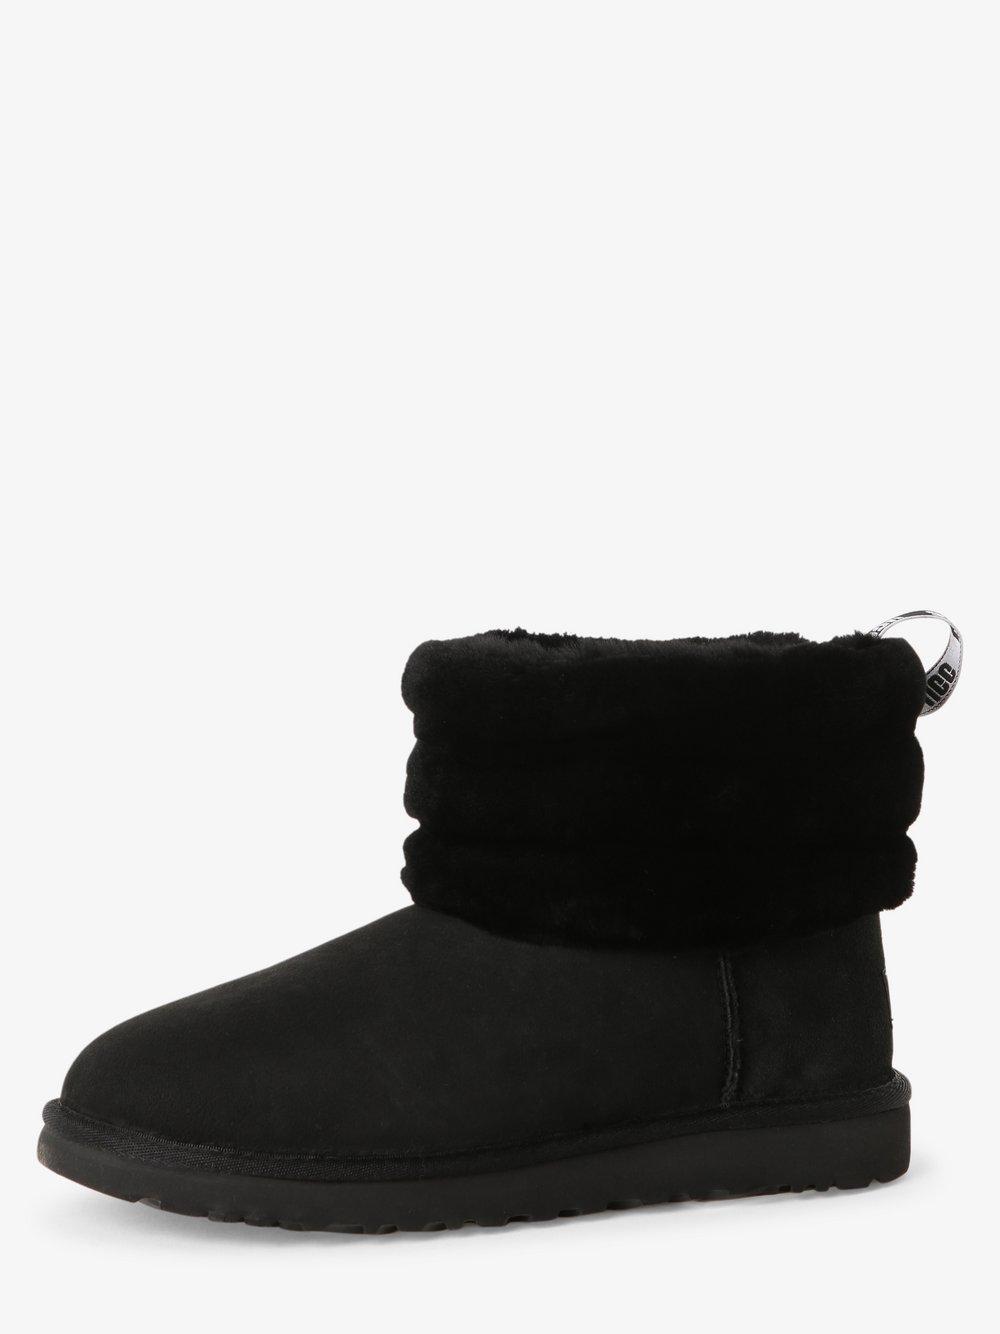 UGG – Skórzane kozaki damskie – Fluff Mini Quilted, czarny Van Graaf 478475-0001-00410